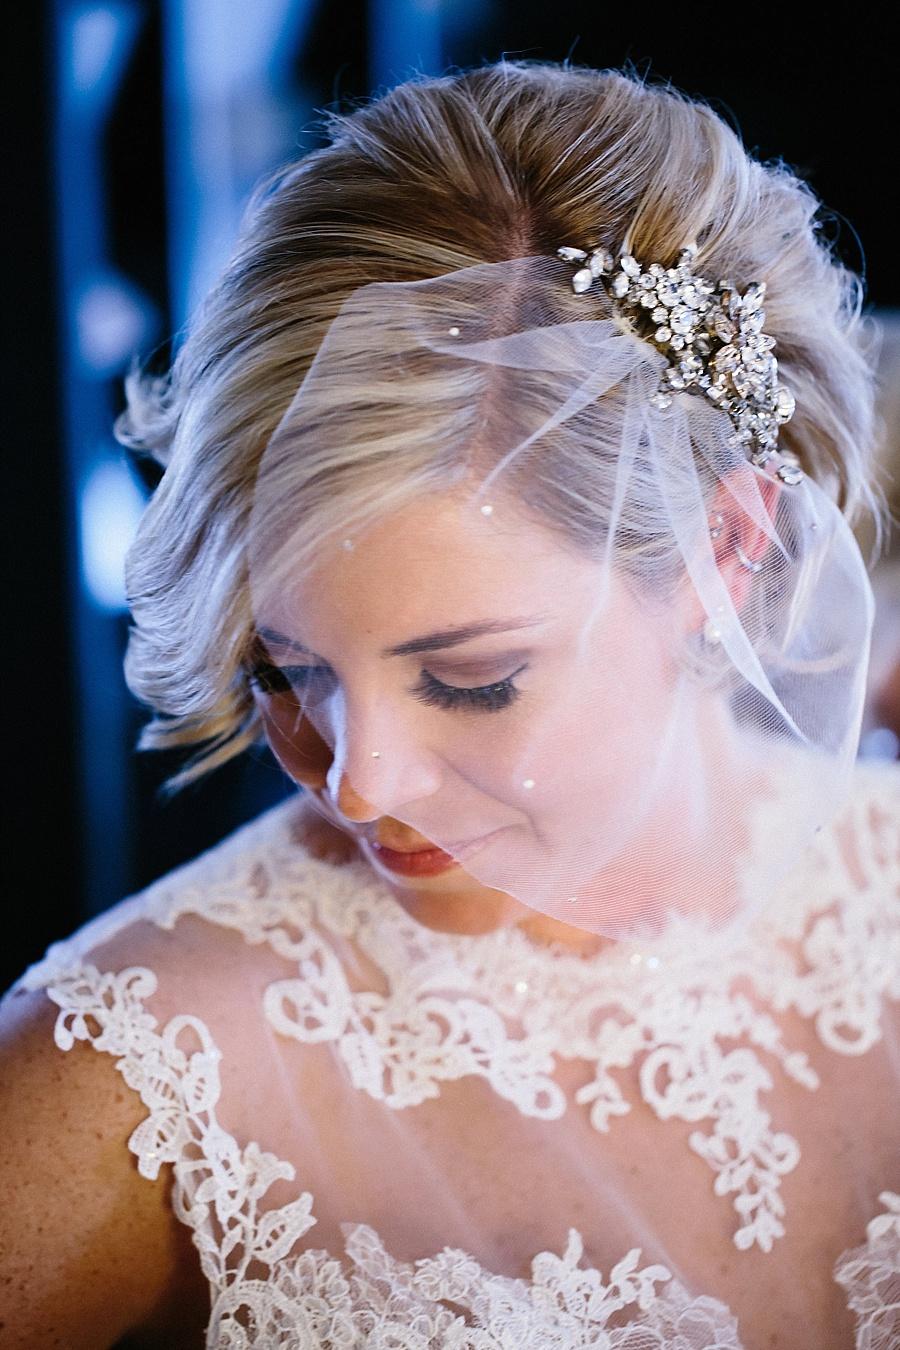 Karmapants_Photography_April_Lynn_Designs_Ballroom_at_the_Ben_Finley_Catering_Luxe_Elegant_Wedding_Art_Deco_Gatsby_Gold_Black_Bridal_Portraits_Getting_Ready-230